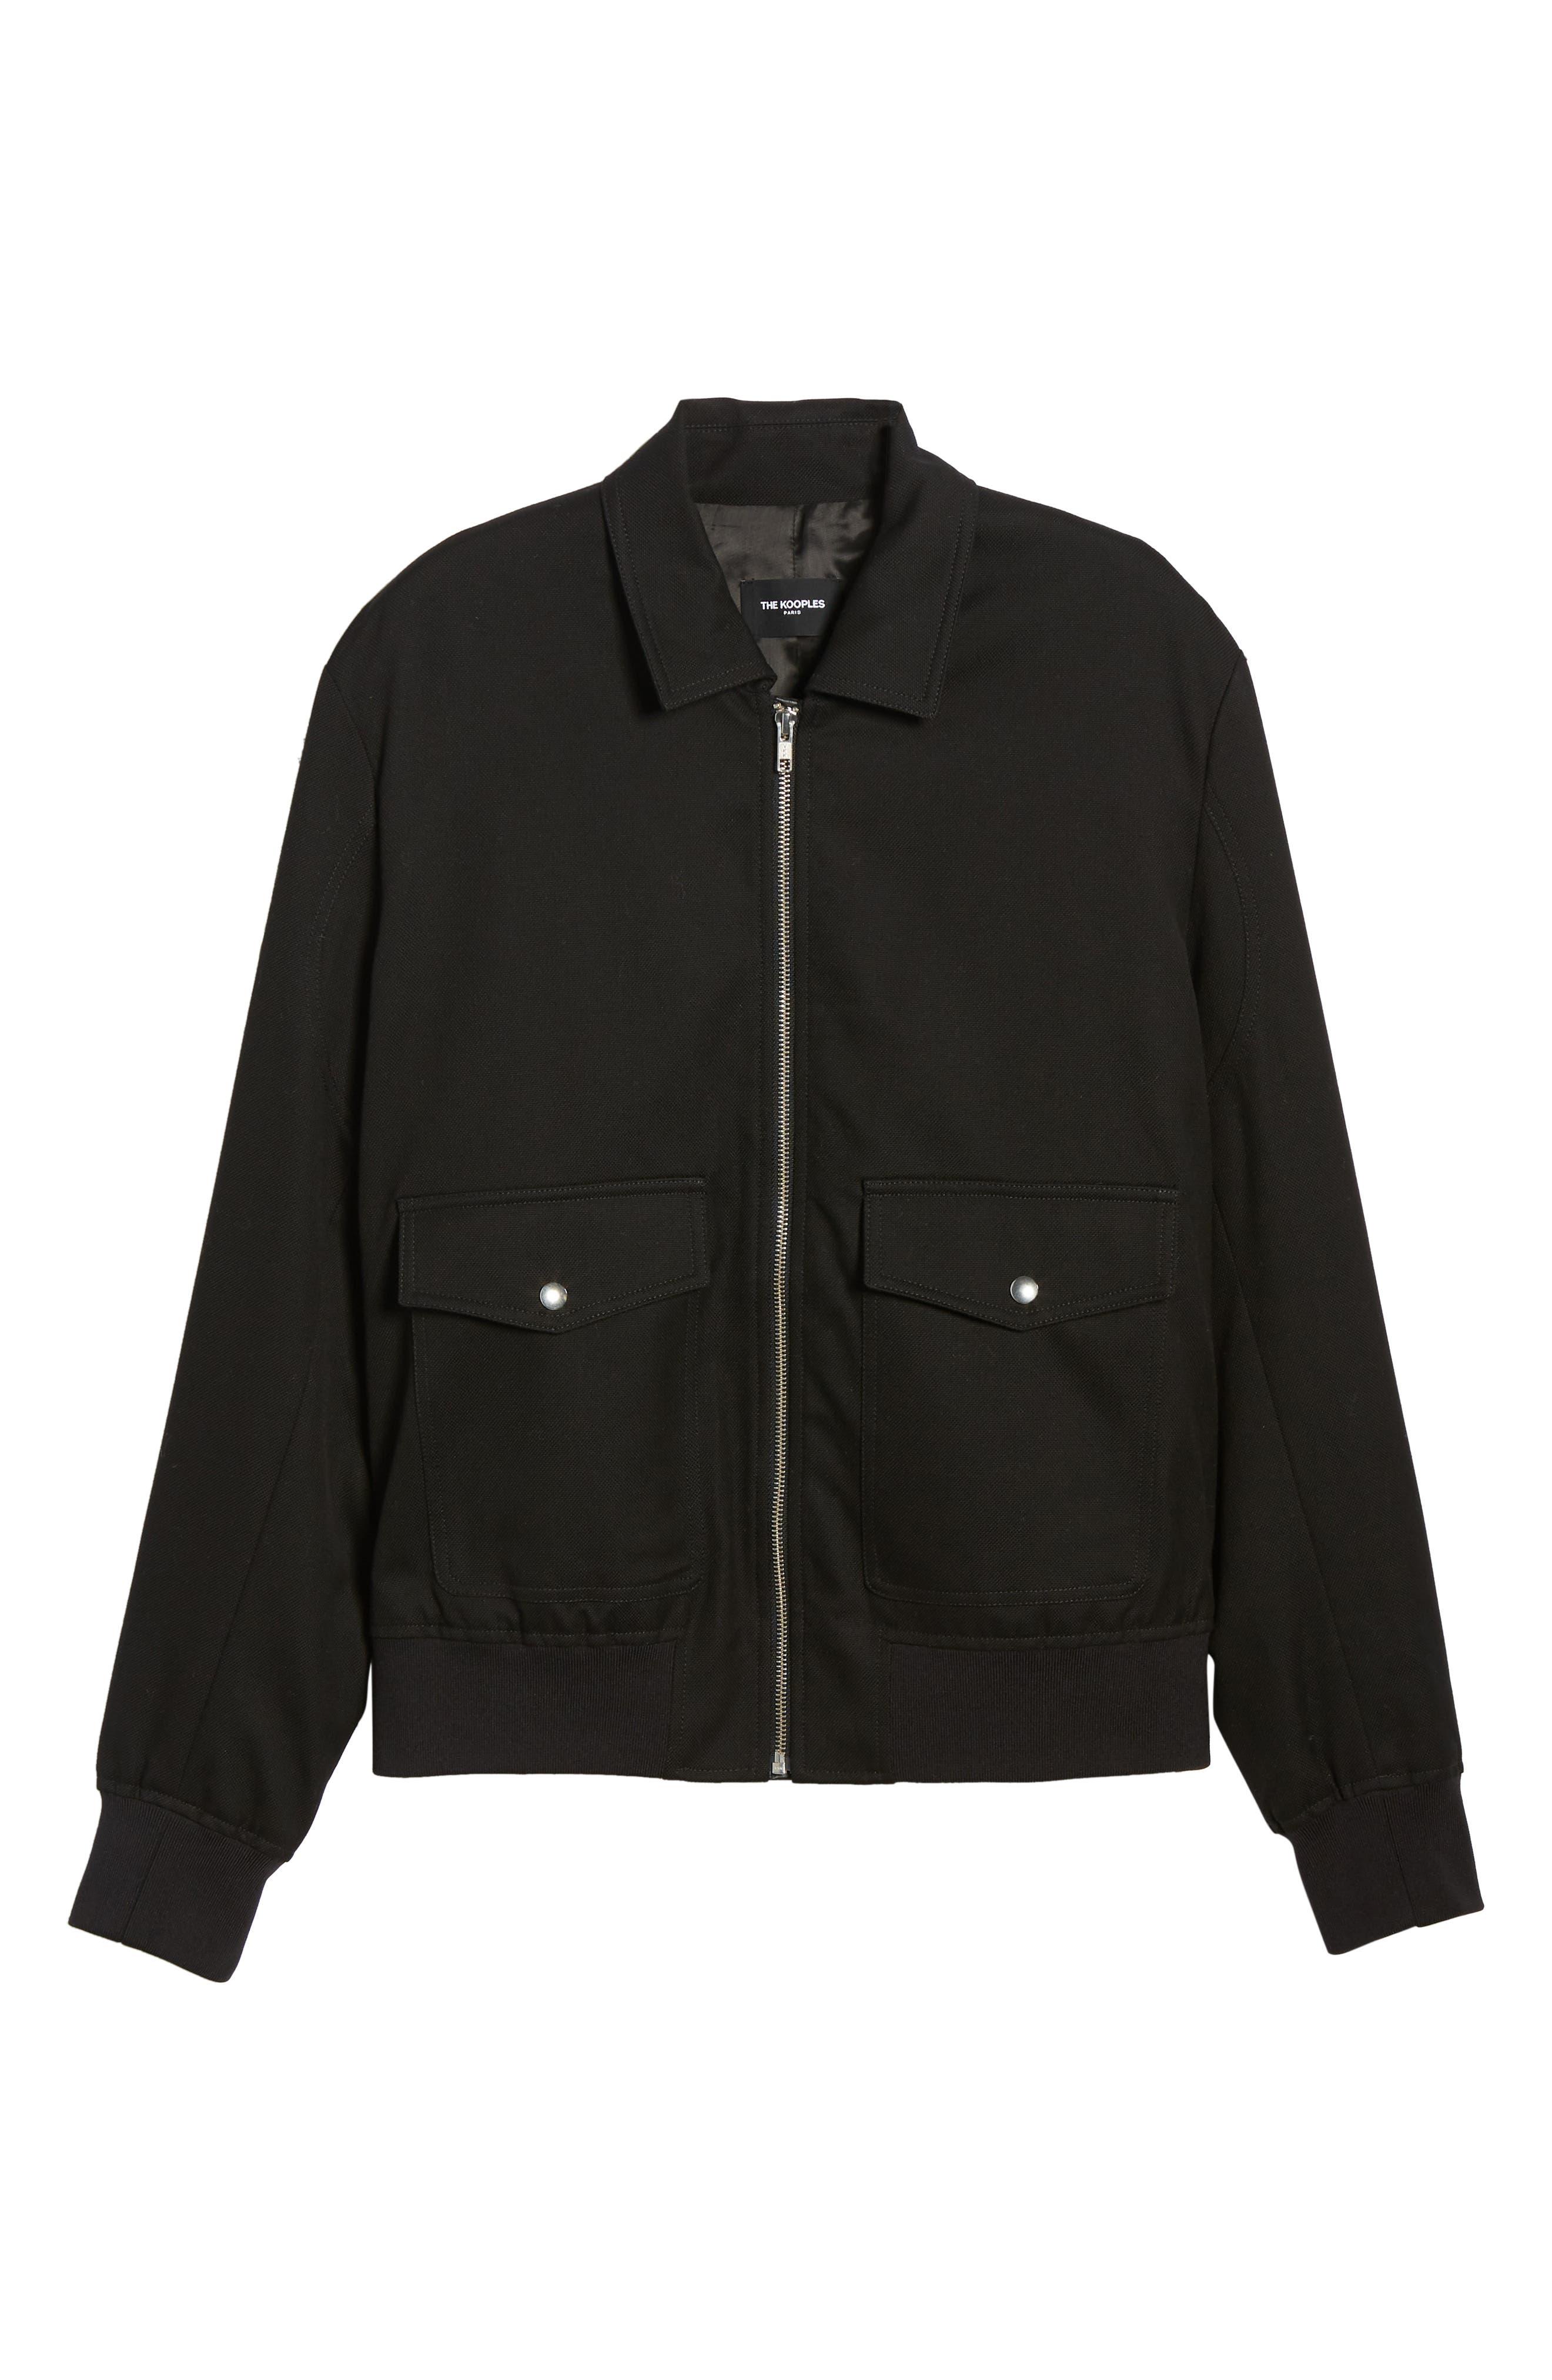 THE KOOPLES, Leather Detail Jacket, Alternate thumbnail 5, color, BLACK